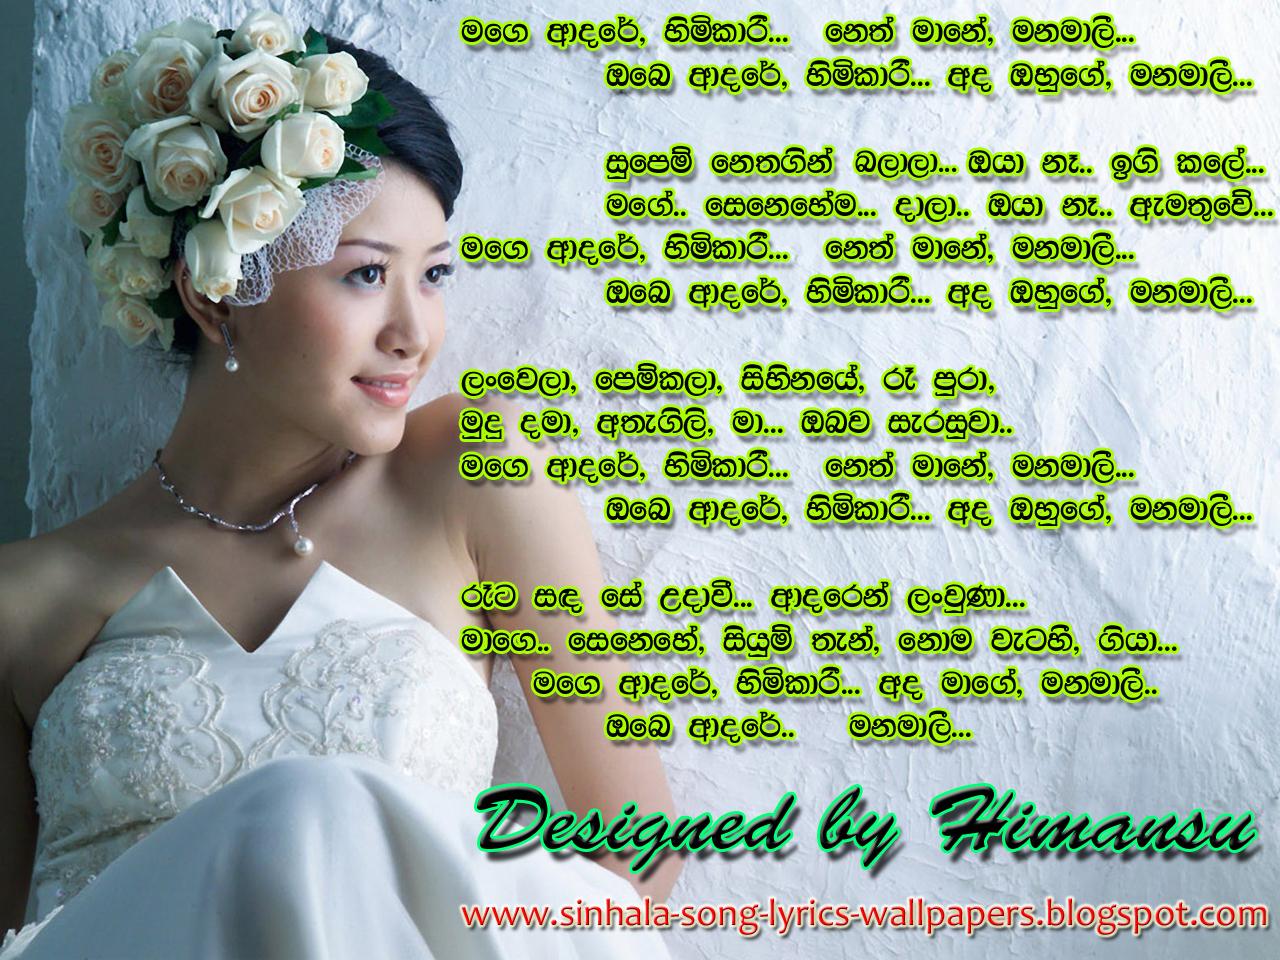 Song Lyrics 2013 Sinhala Song Lyrics Wallpapers 1280x960